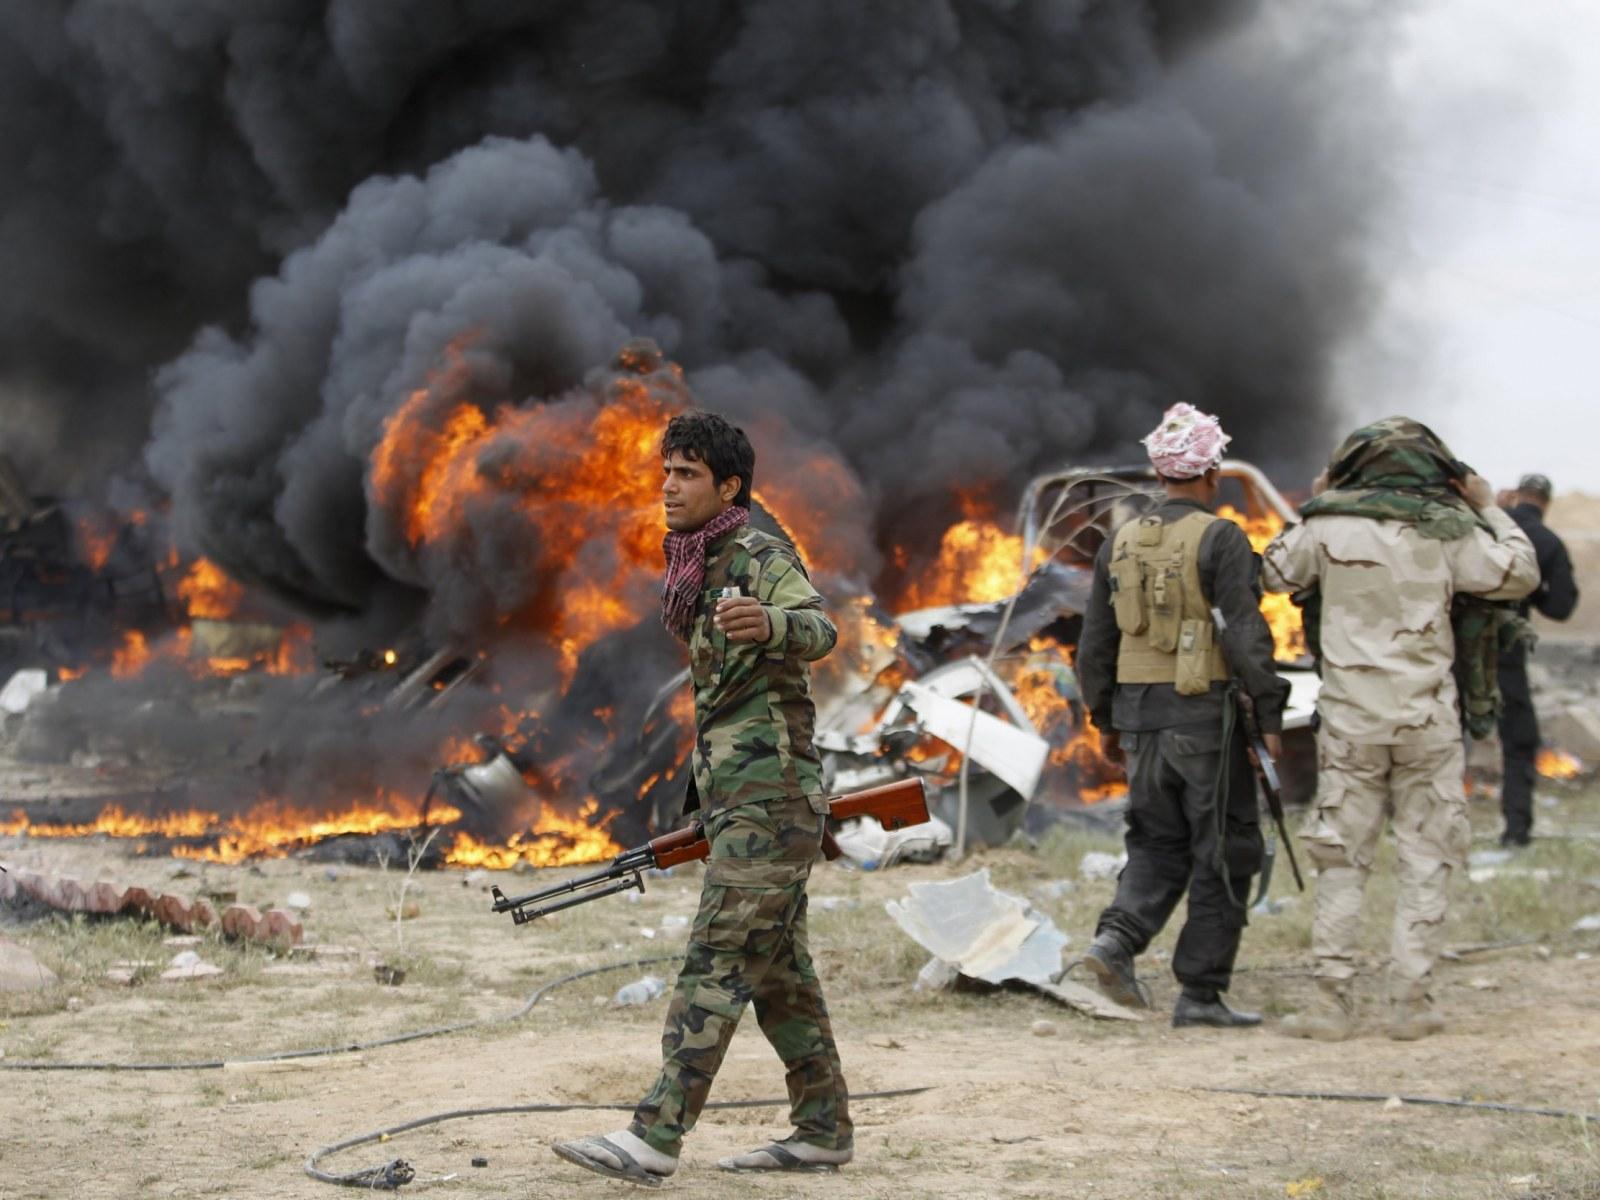 Baghdad Under Pressure to Stop Shia Militia War Crimes 1600x1200